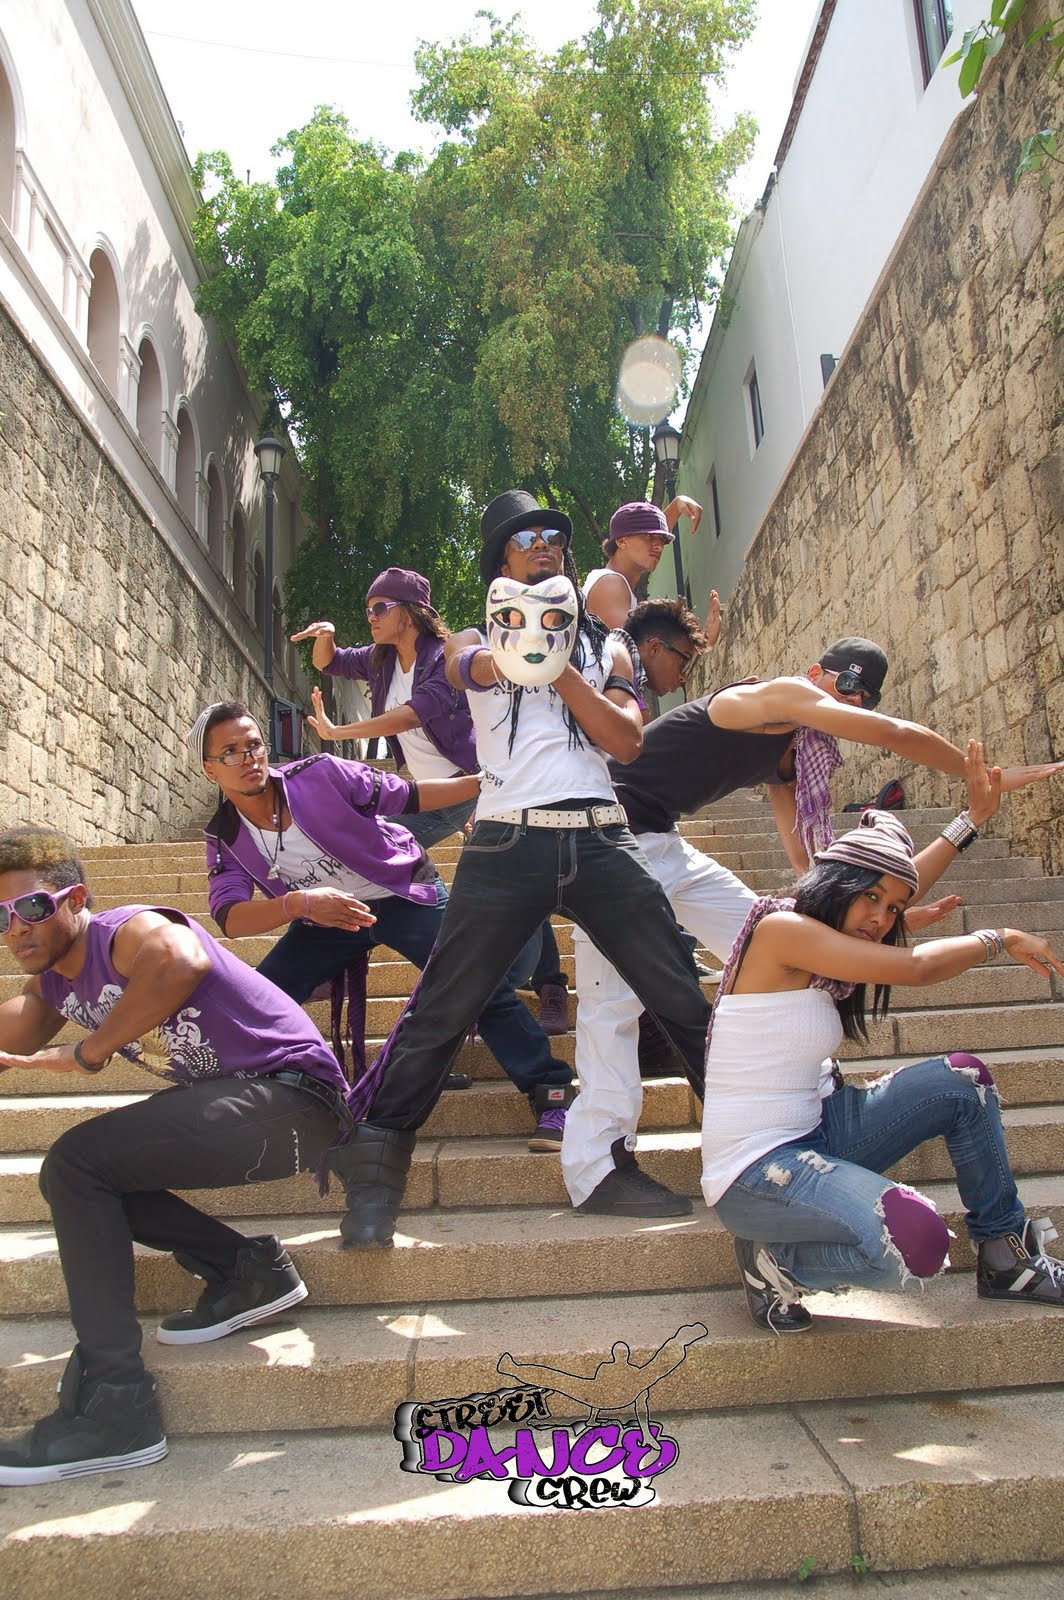 Street Dance Crew RD